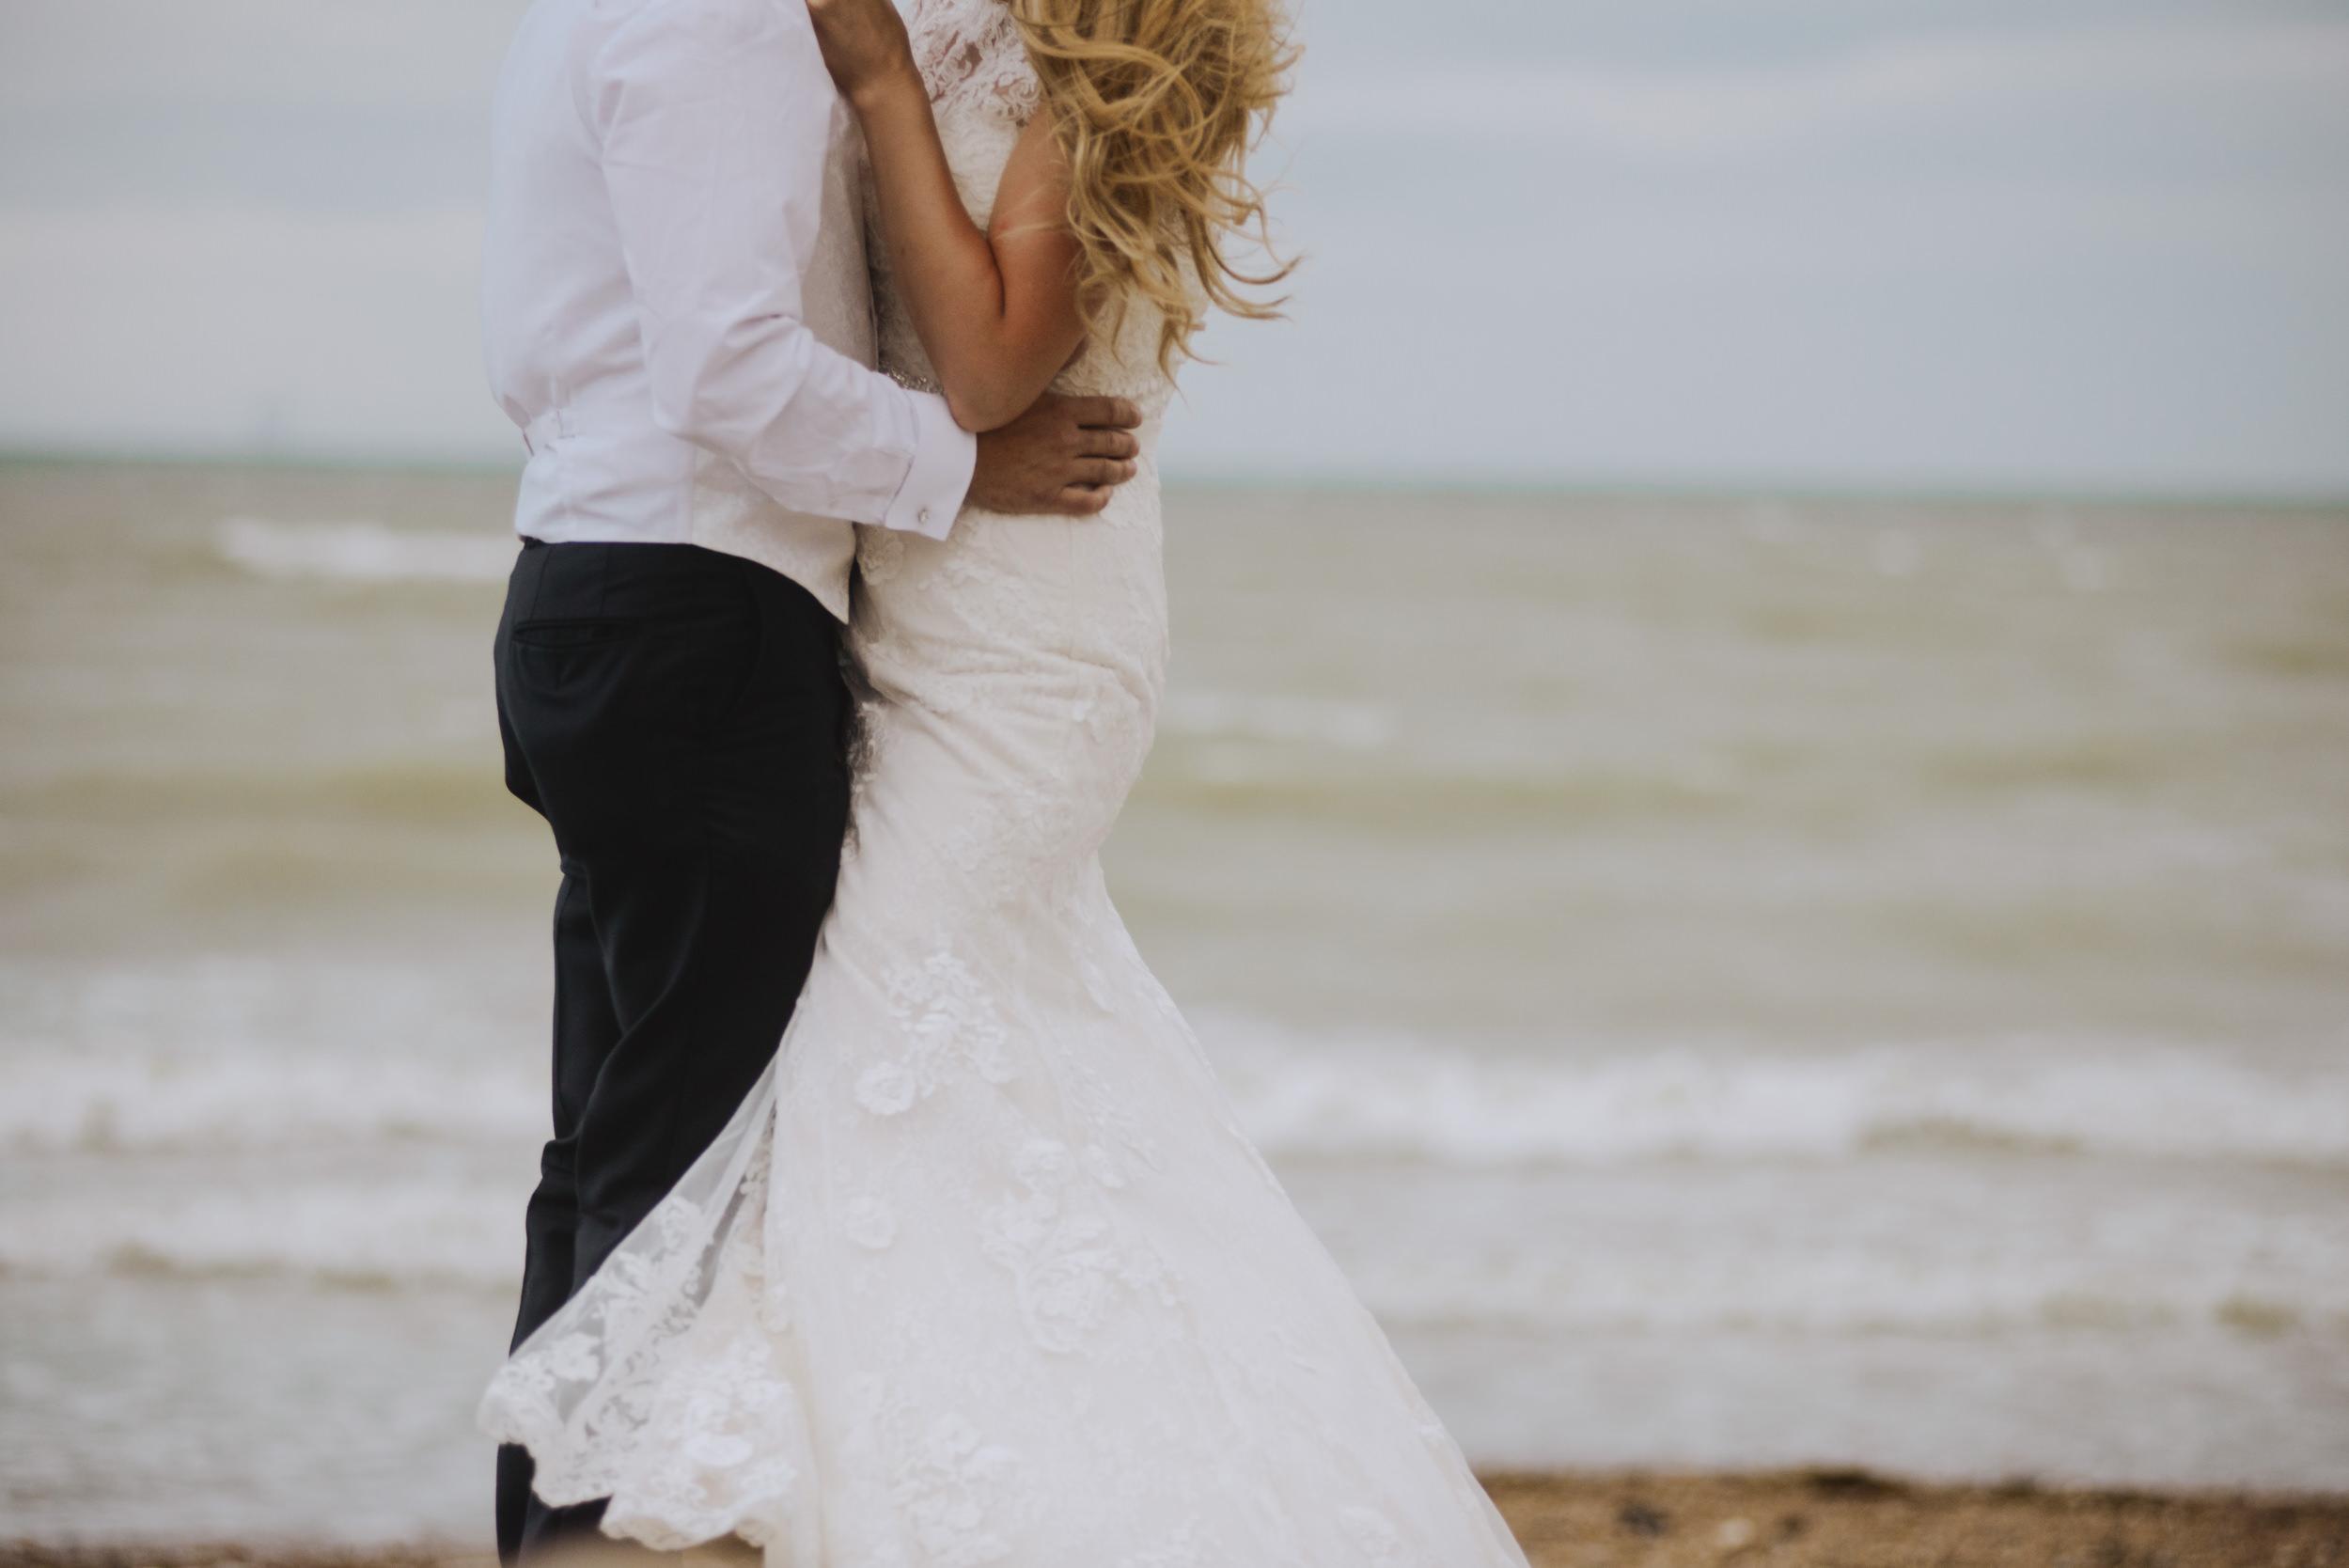 worthing-pier-wedding-021.JPG